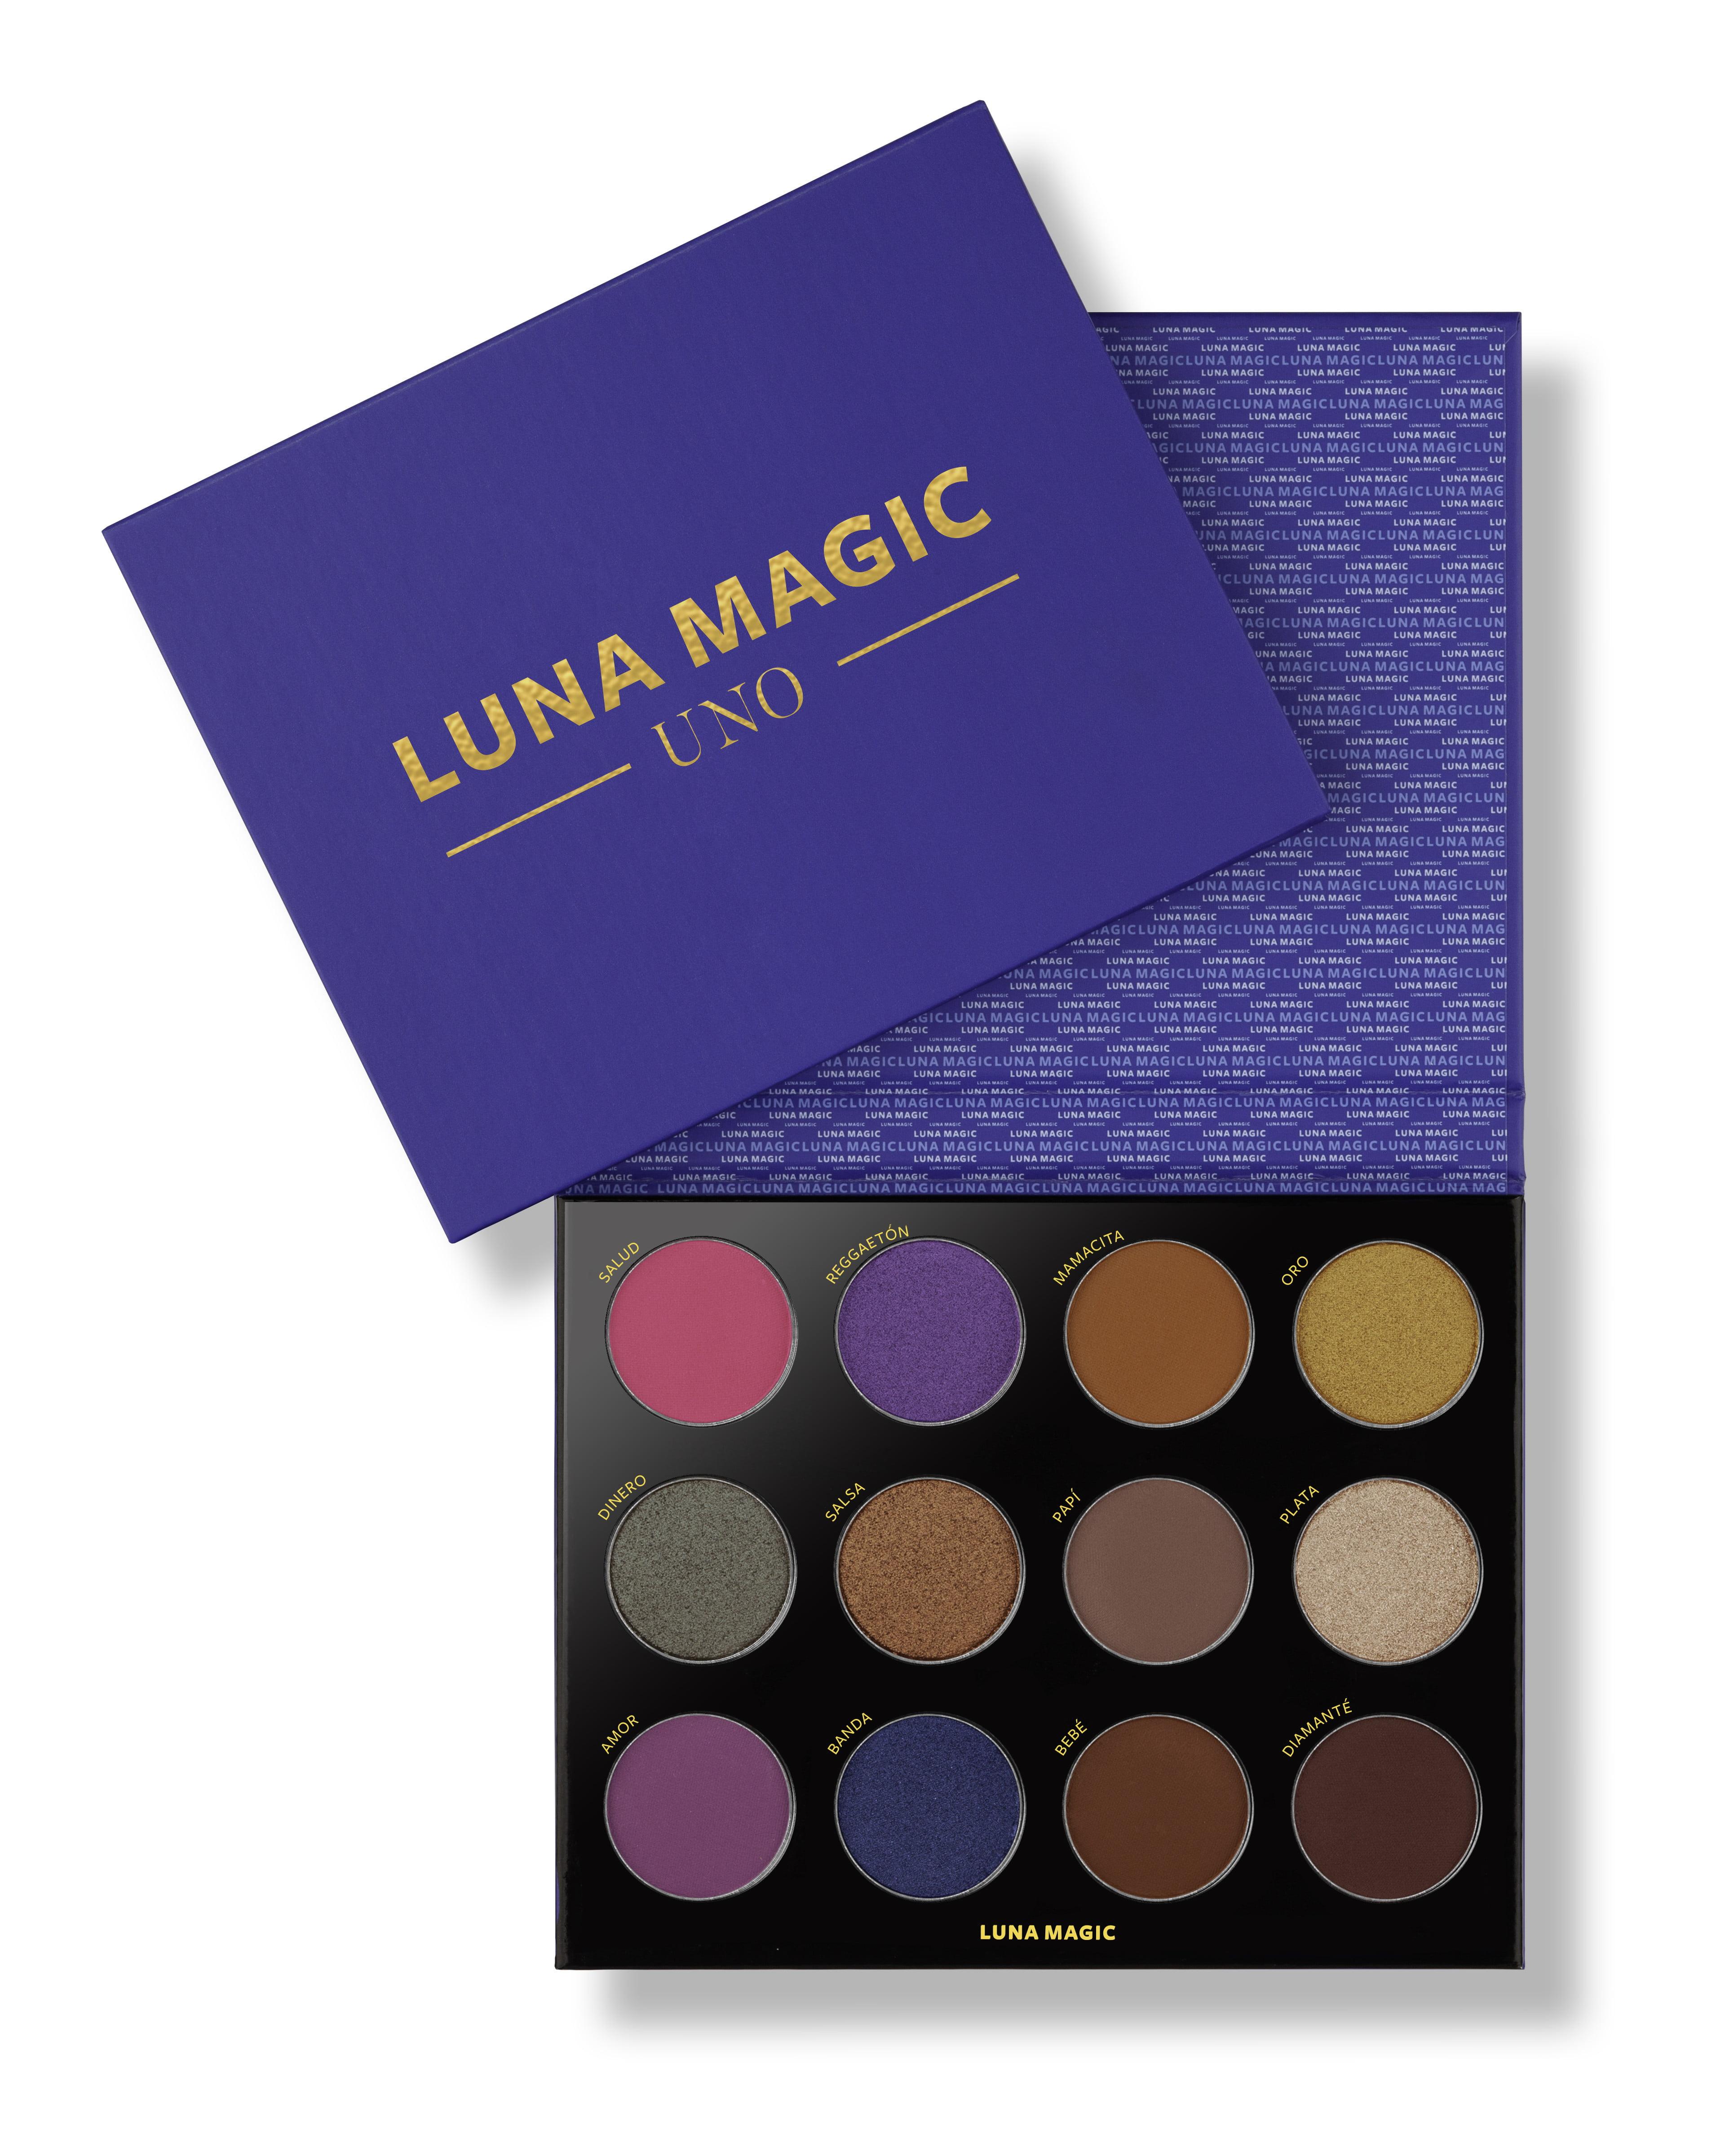 Luna Magic Eyeshadow Makeup Palette 12